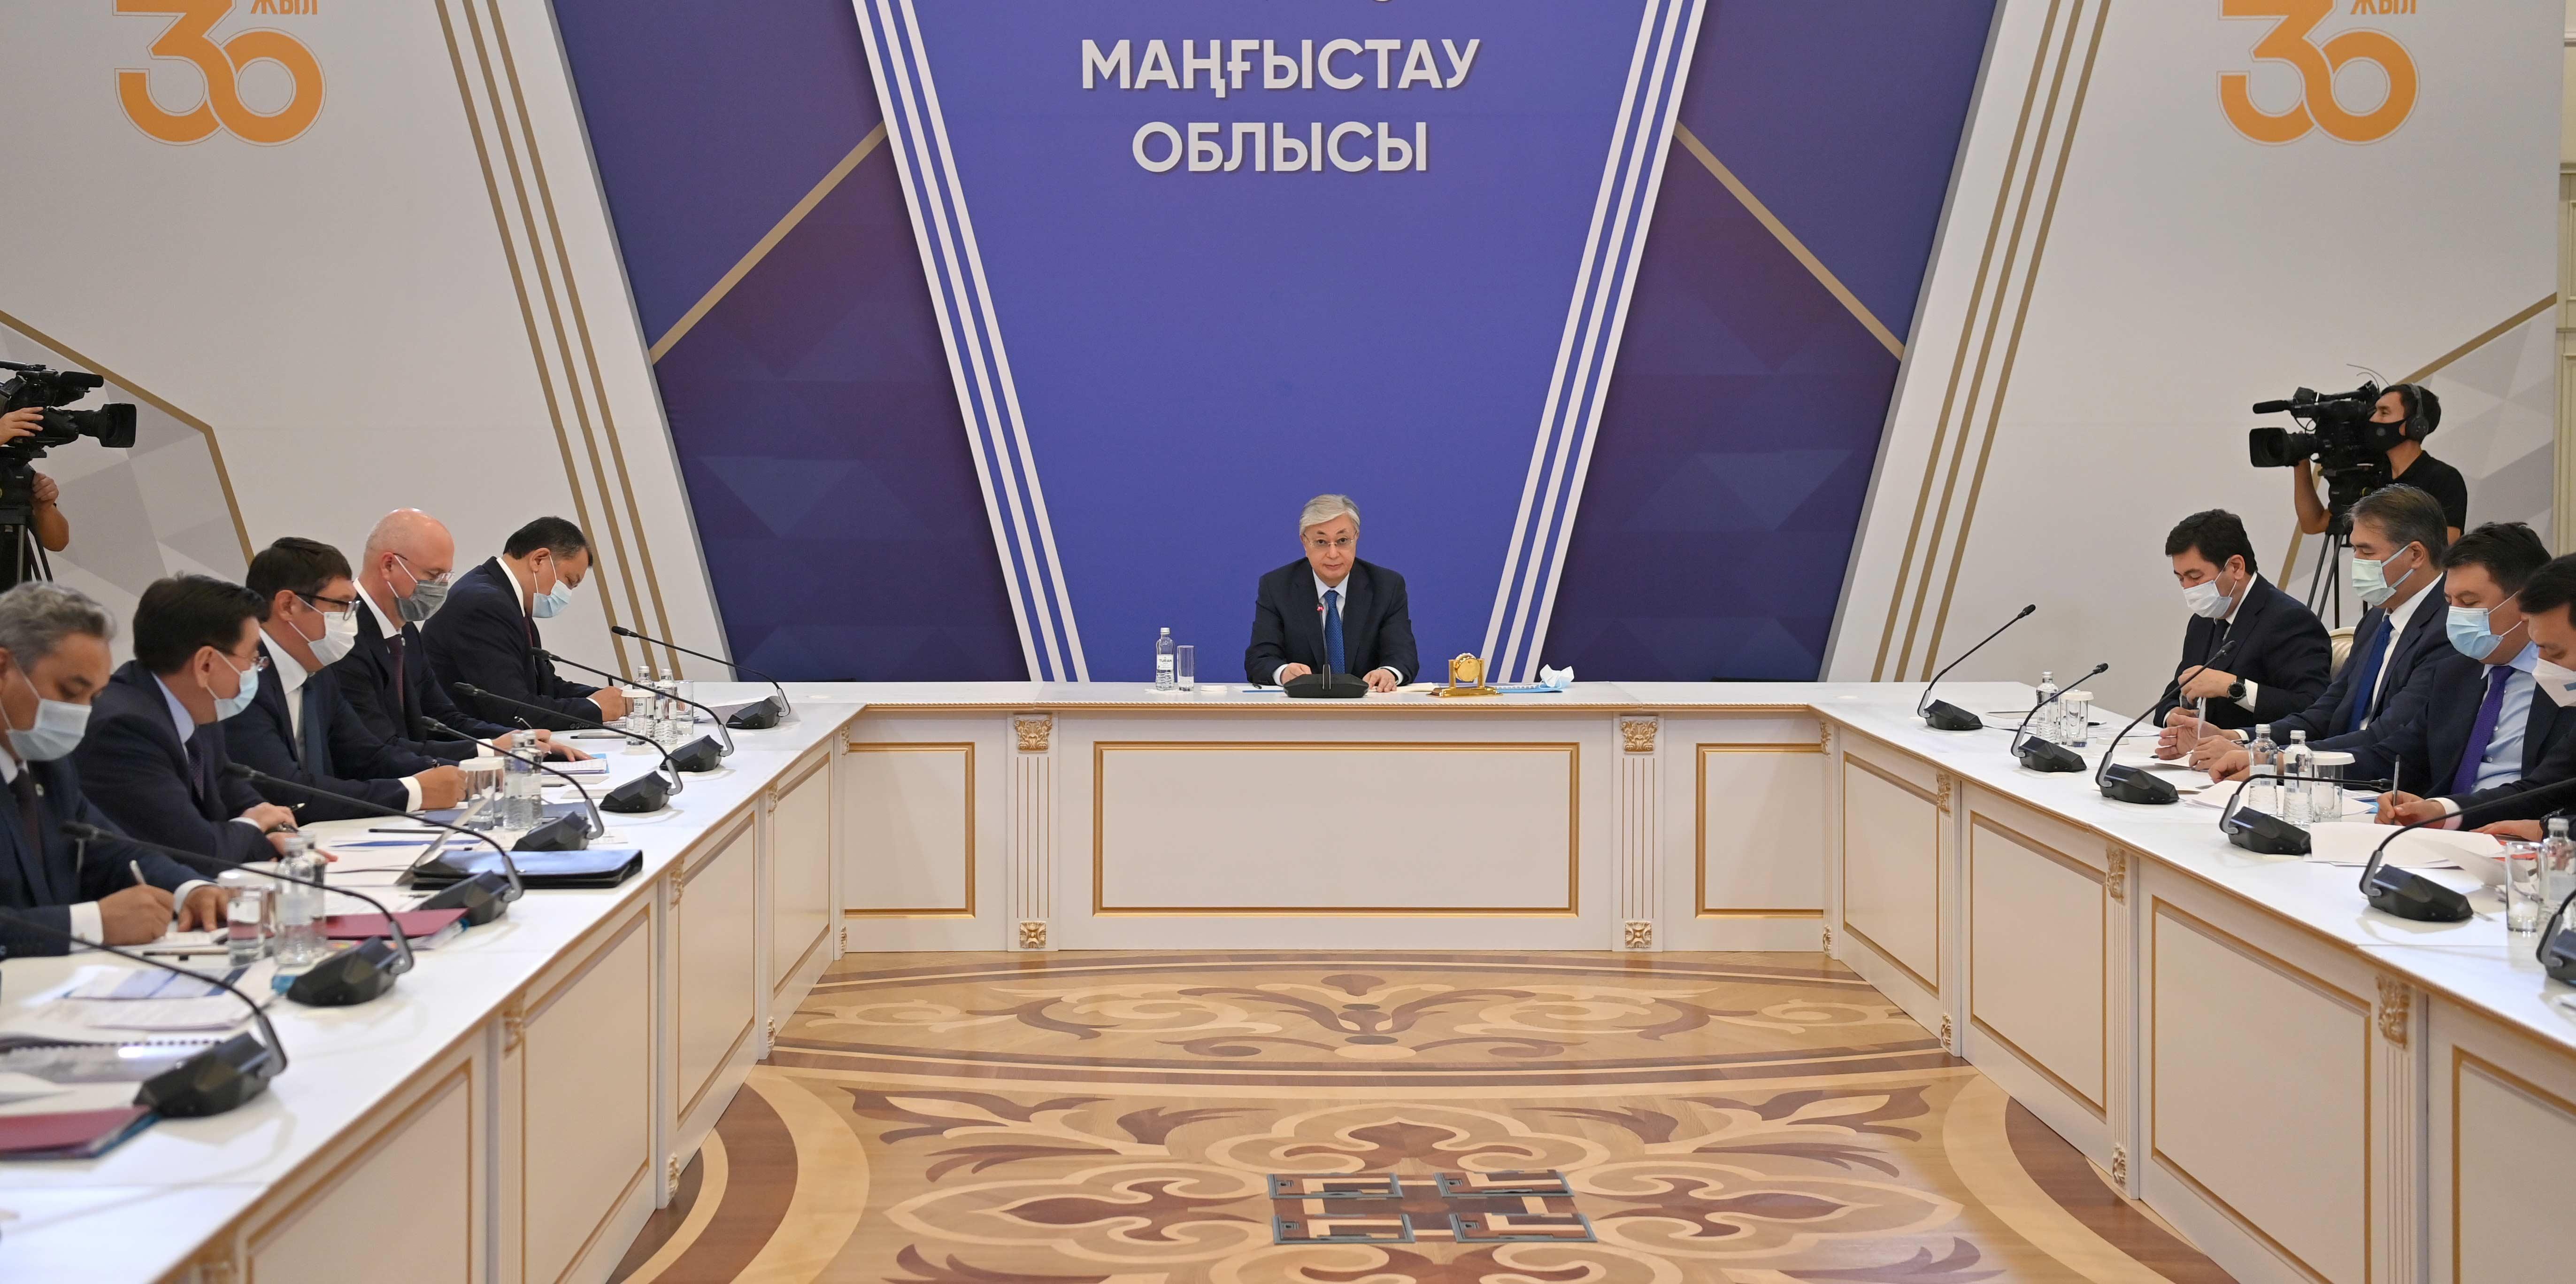 Президент объяснил назначение Ногаева акимом Мангистауской области